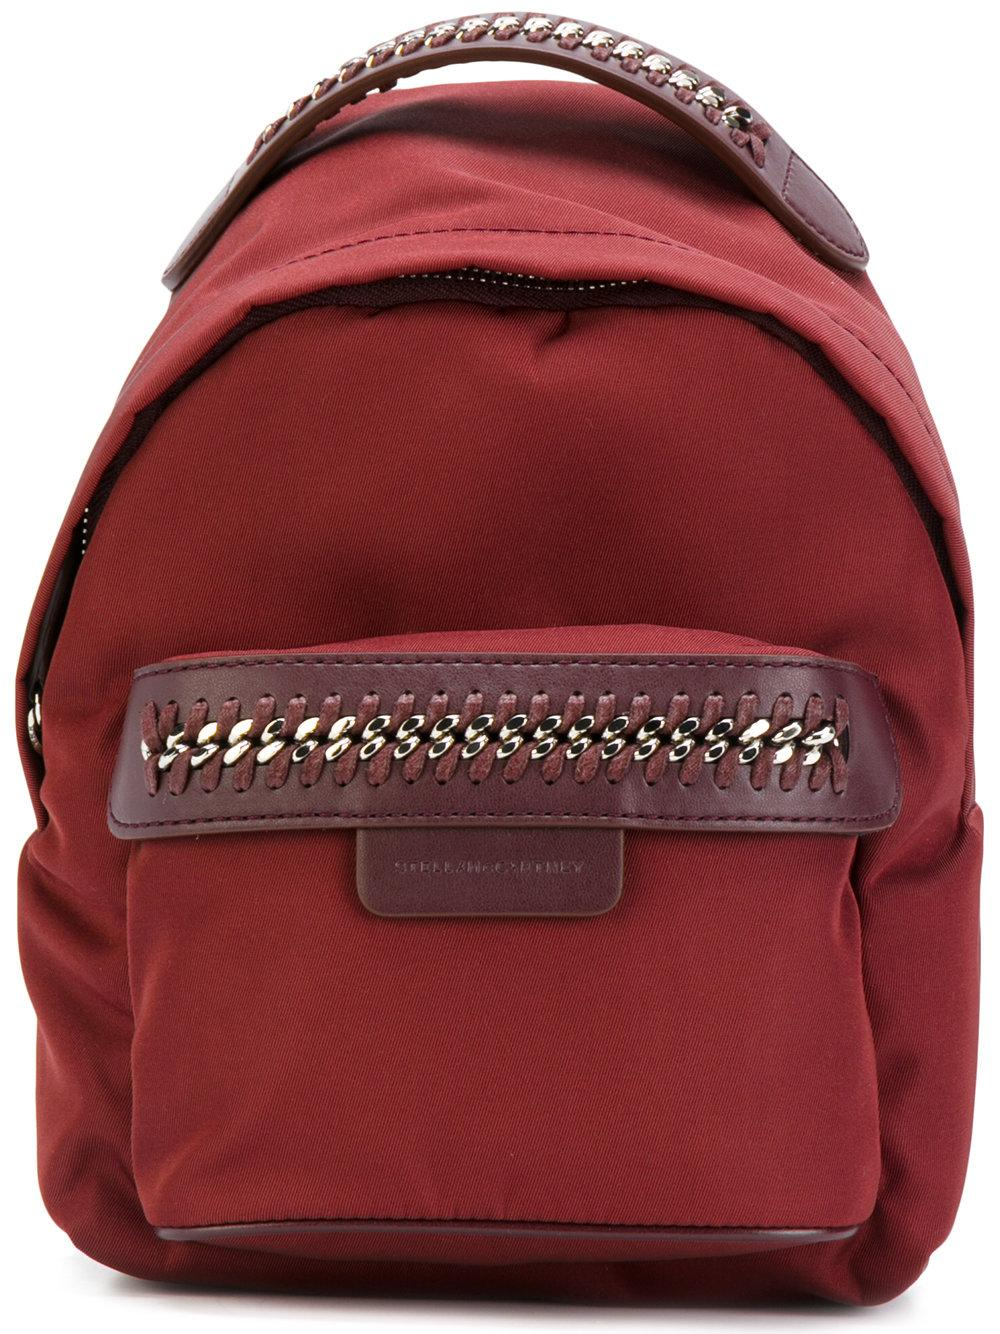 stella mccartney falabella go backpack in red lyst. Black Bedroom Furniture Sets. Home Design Ideas